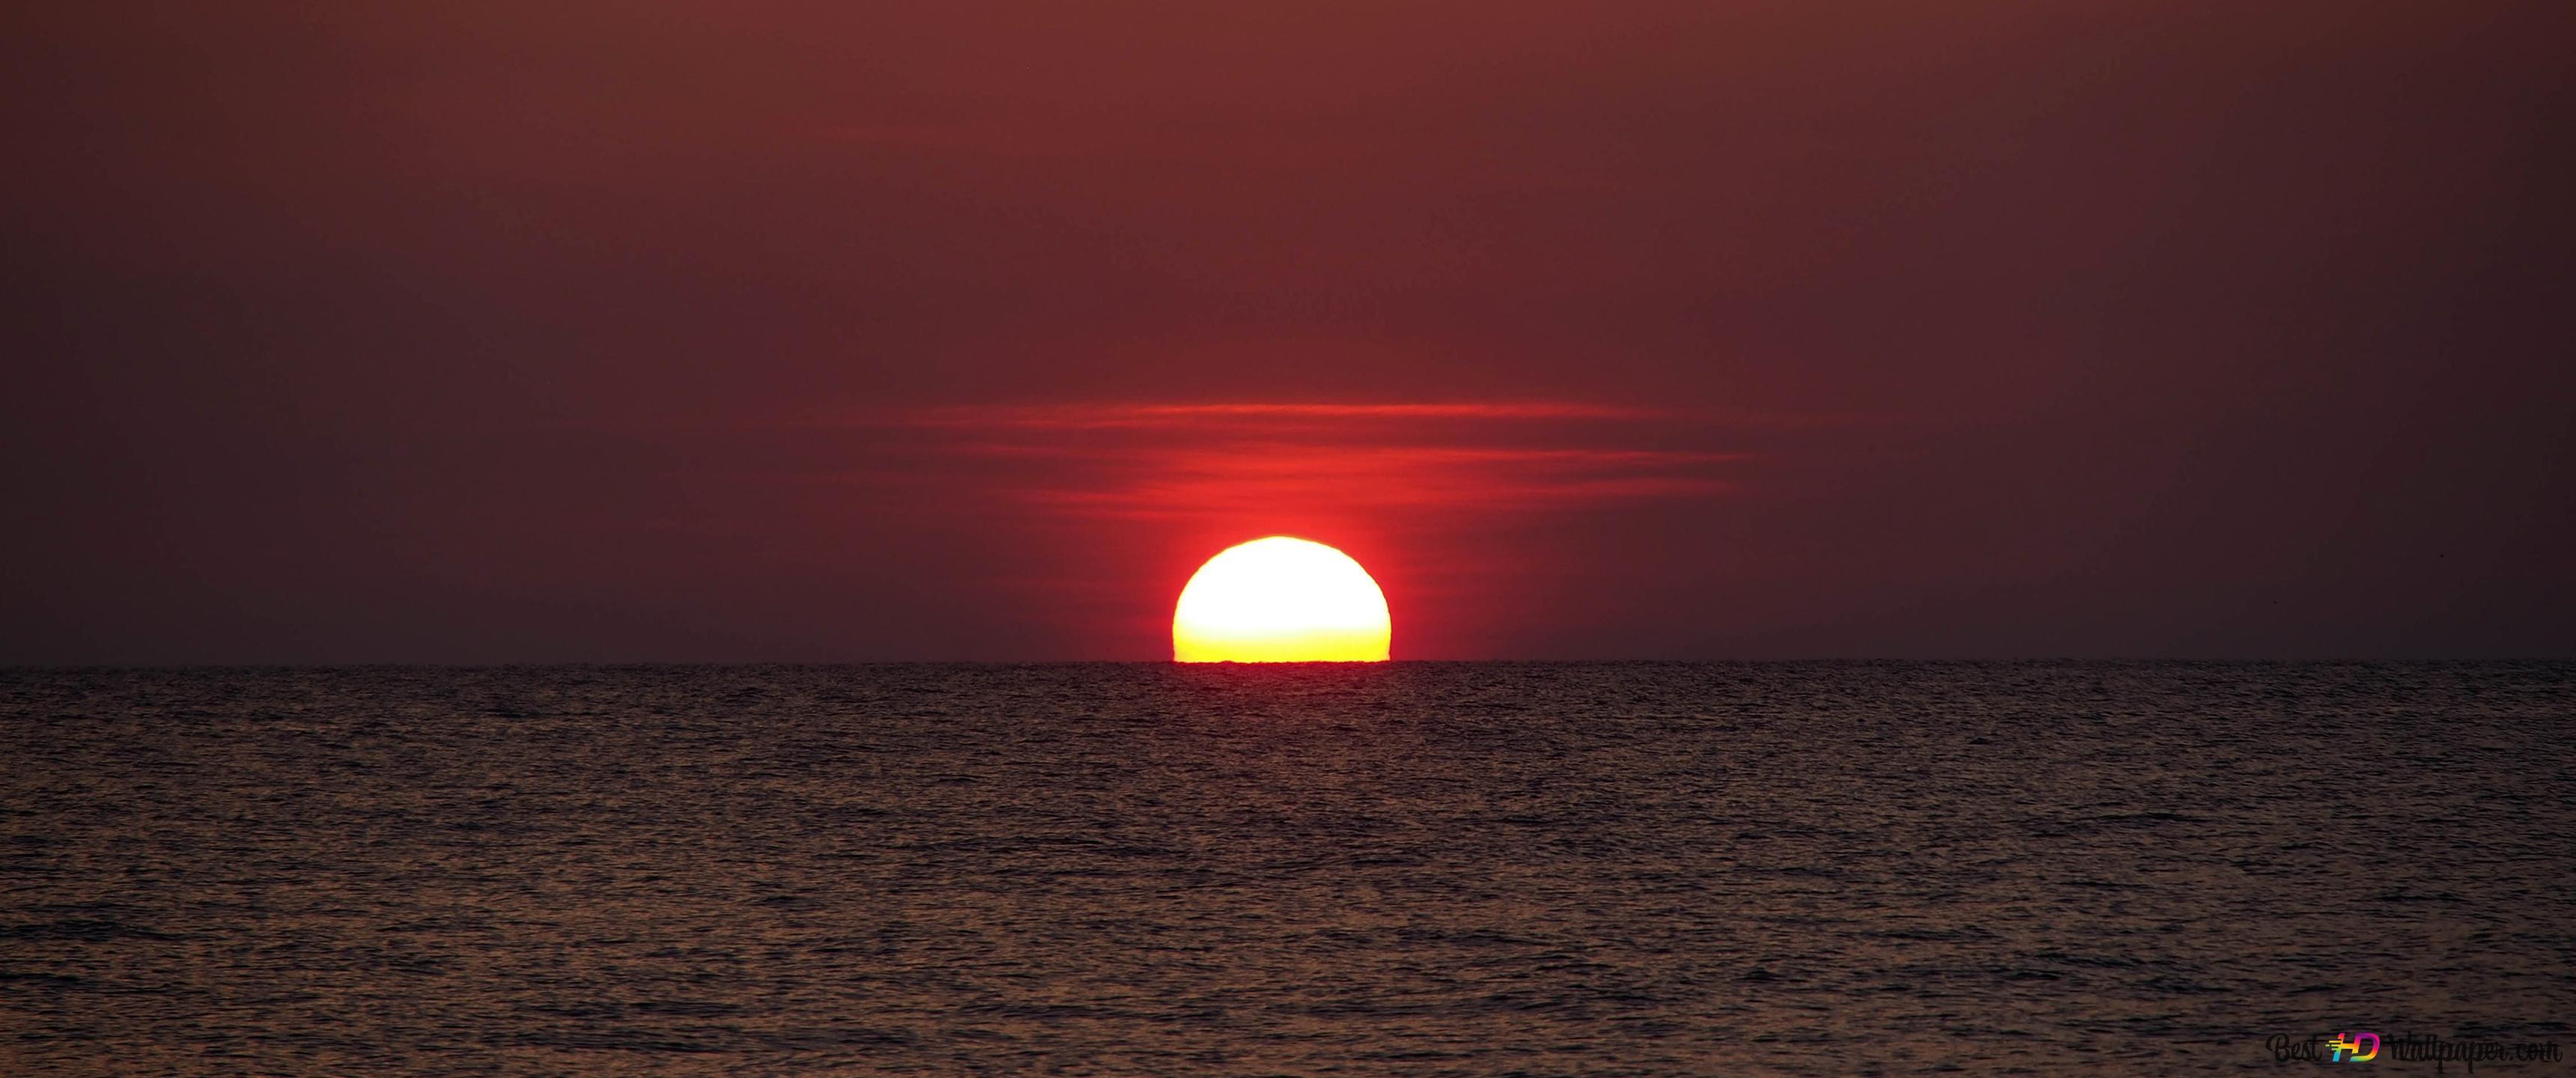 Beautiful Sunrise Hd Wallpaper Download